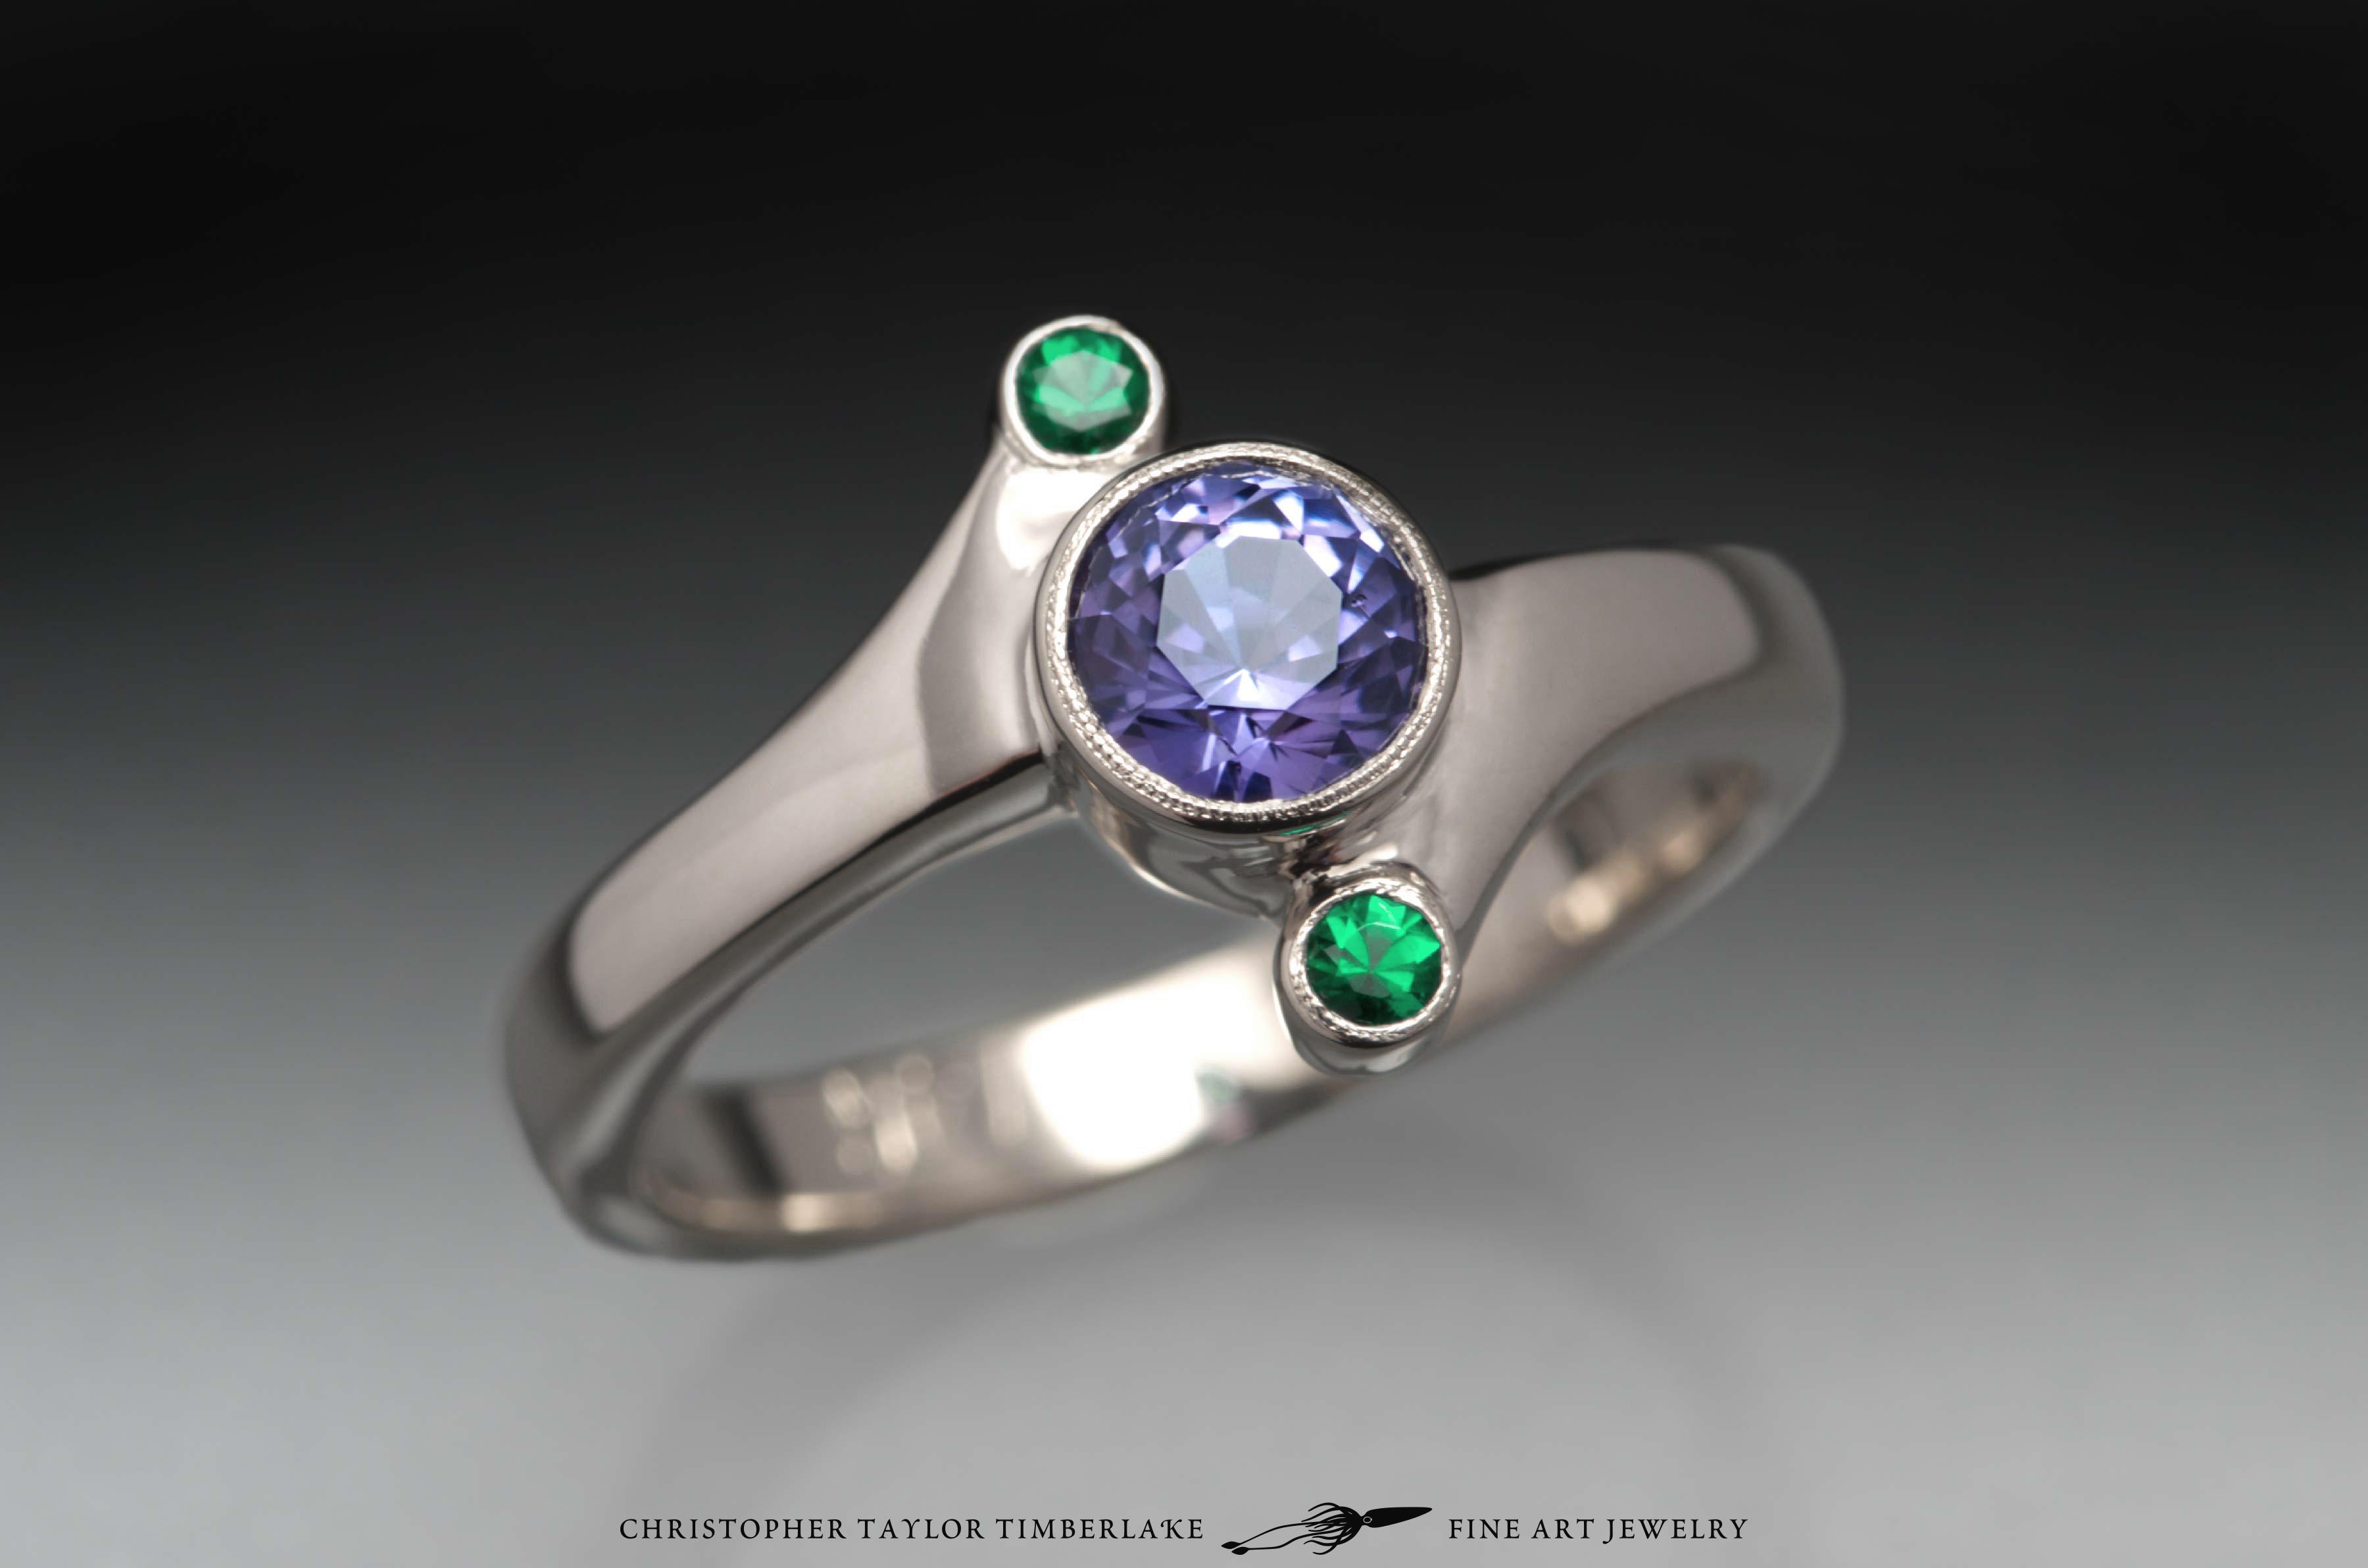 Purple-sapphire-emerald-engagement-ring-14K-karat-super-palladium-white-gold,-0.89CT-5.3mm-round-purple-sapphire-untreated,-2mm-round-emeralds-0.05CTW-5